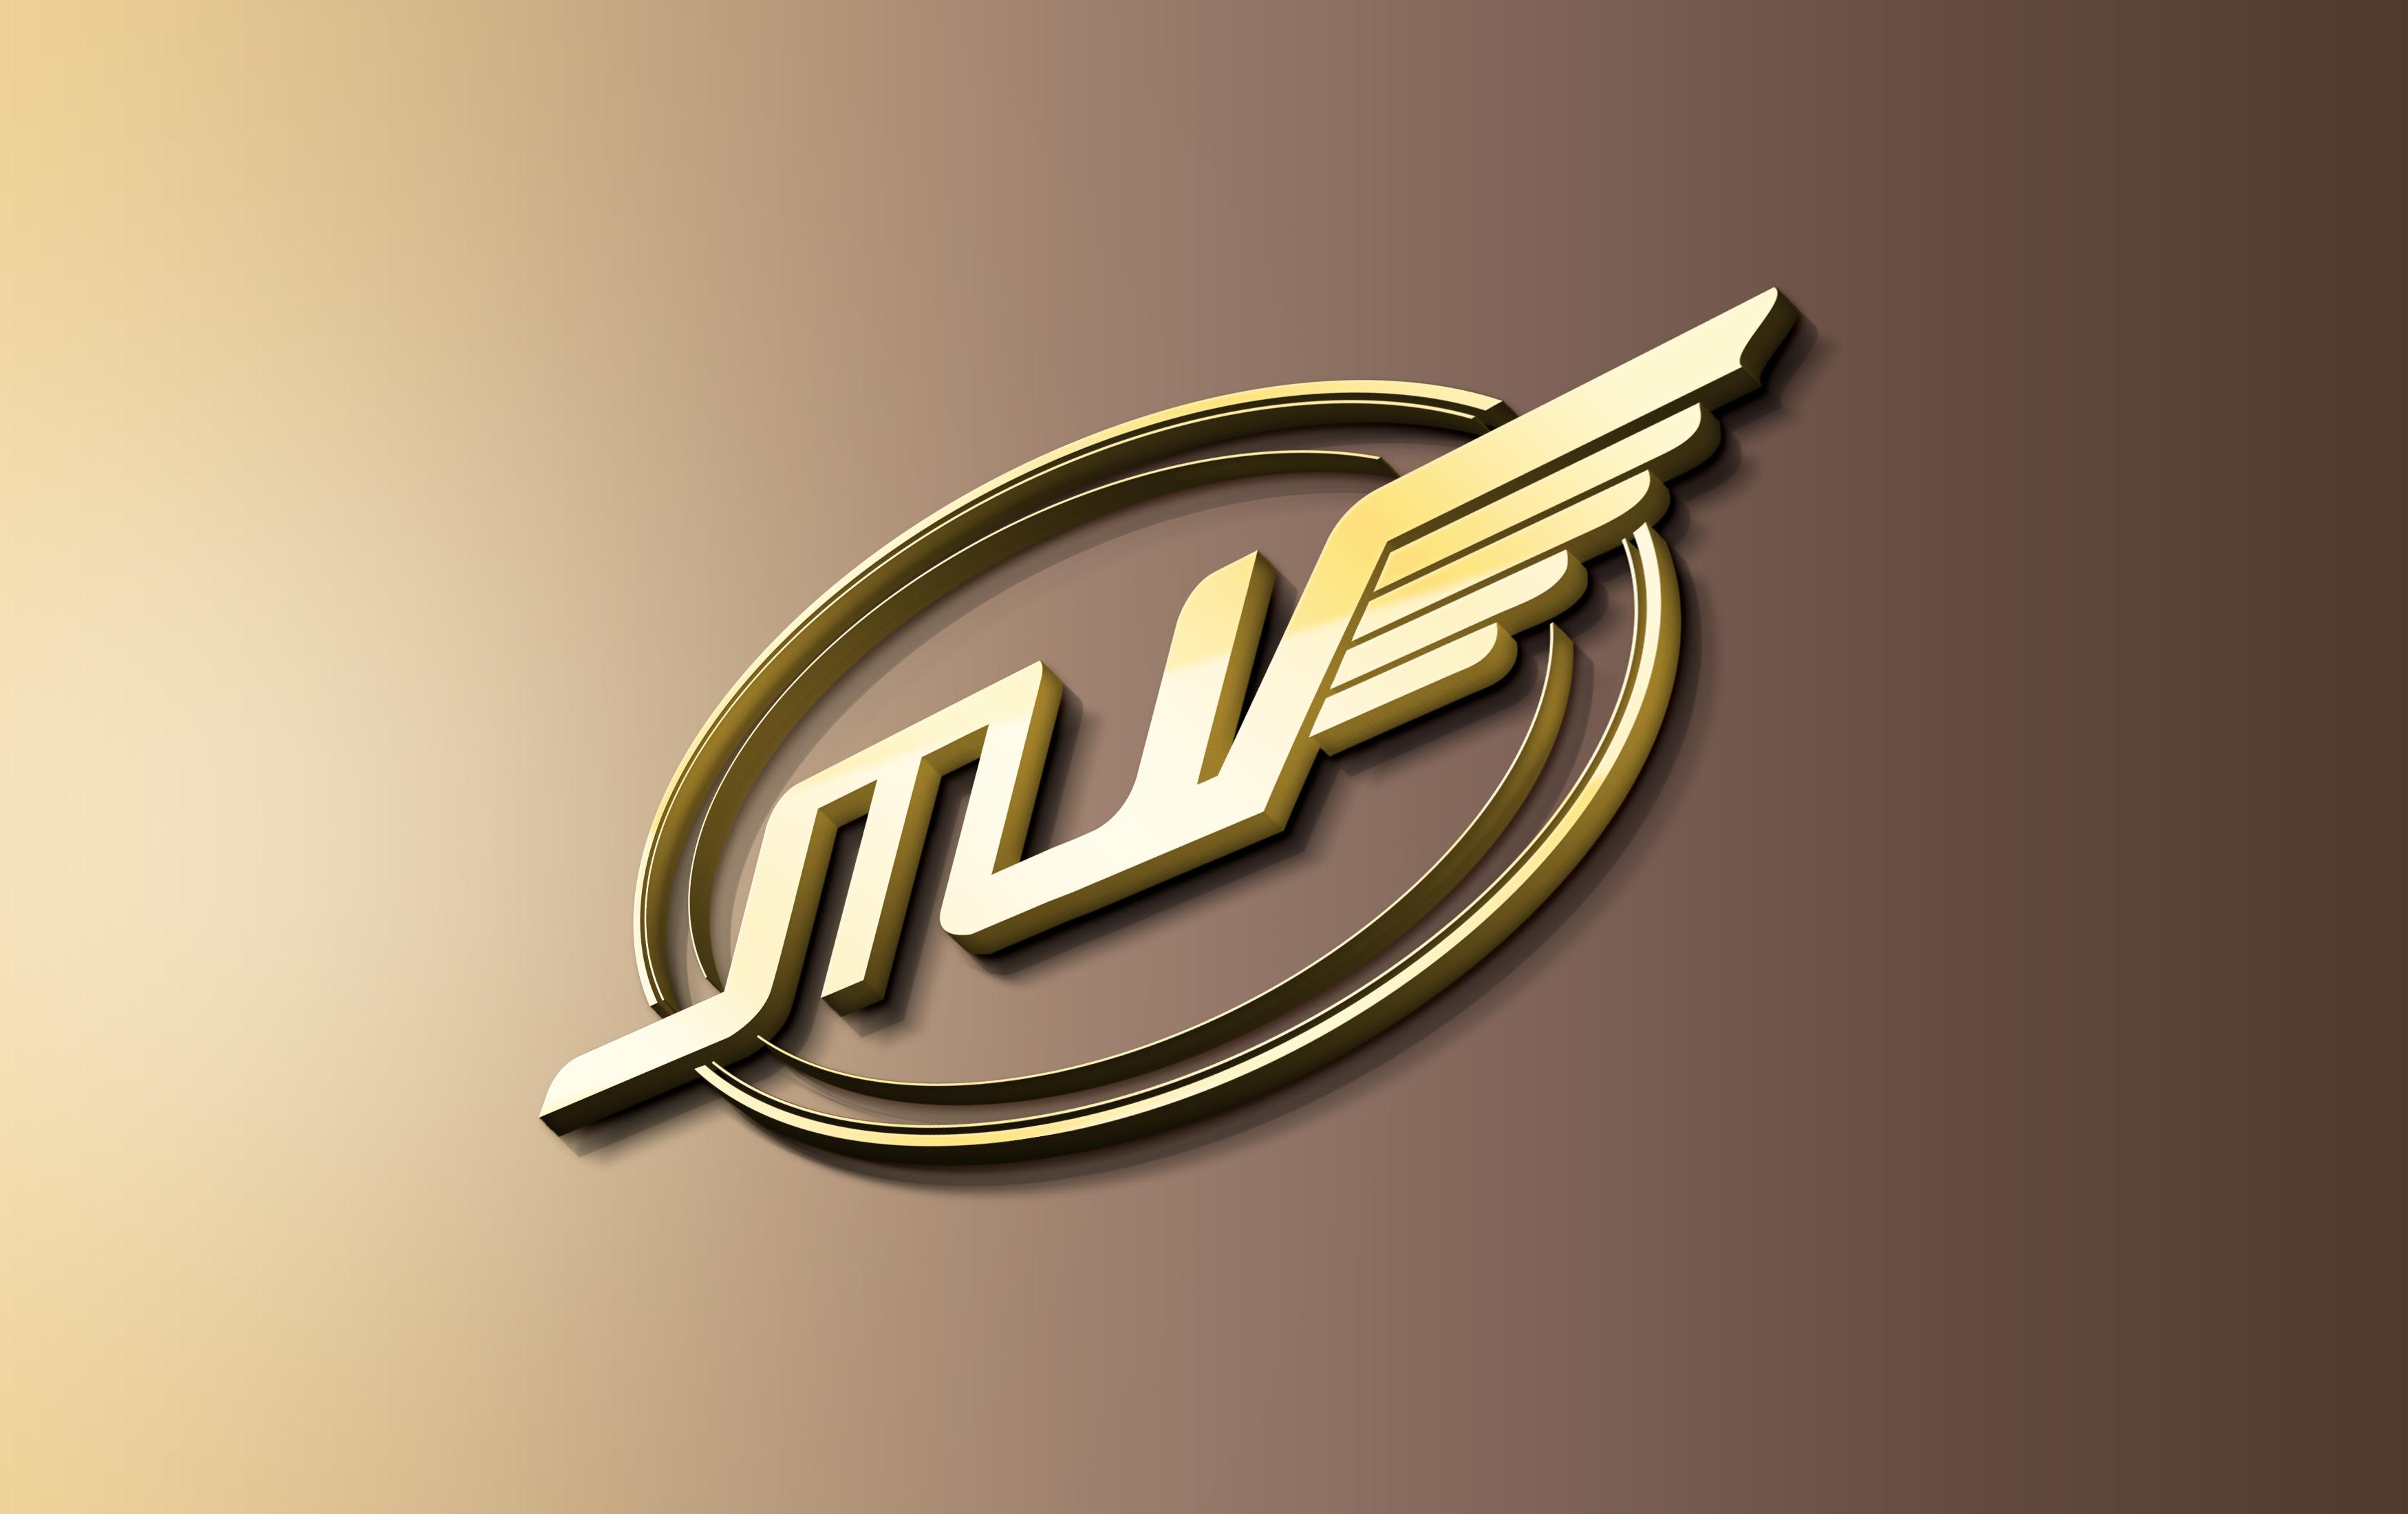 wall-logo-mv